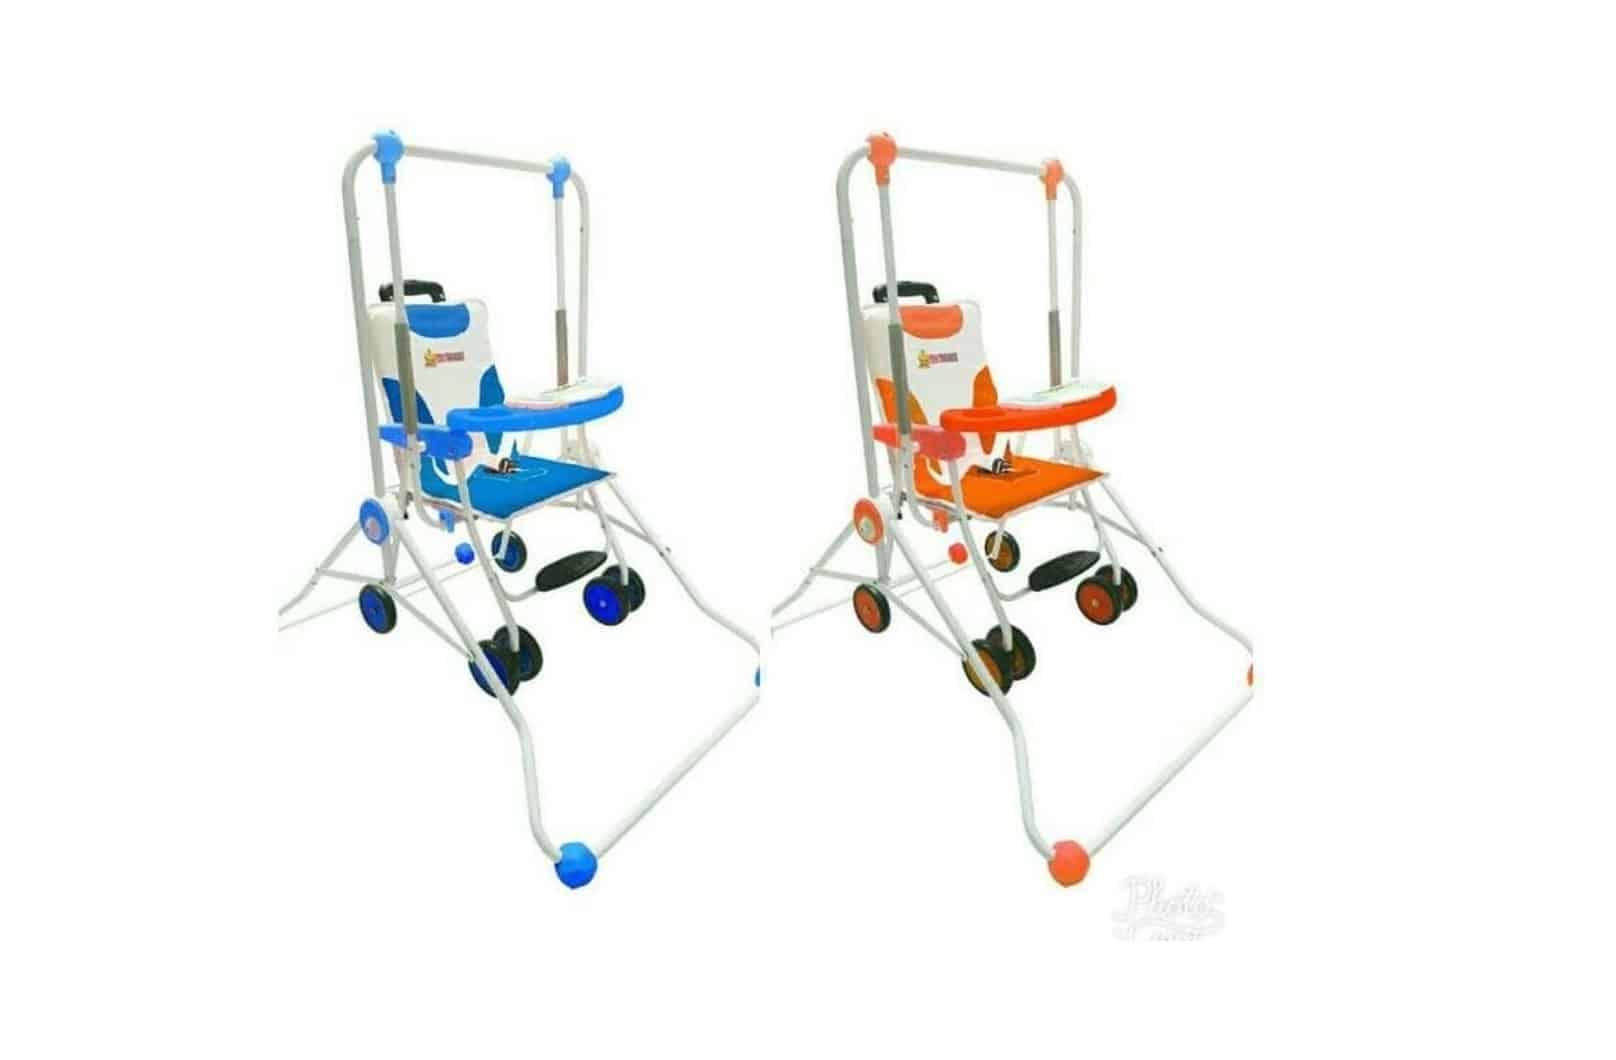 Tajimaku-Chair-Swing-Stroller